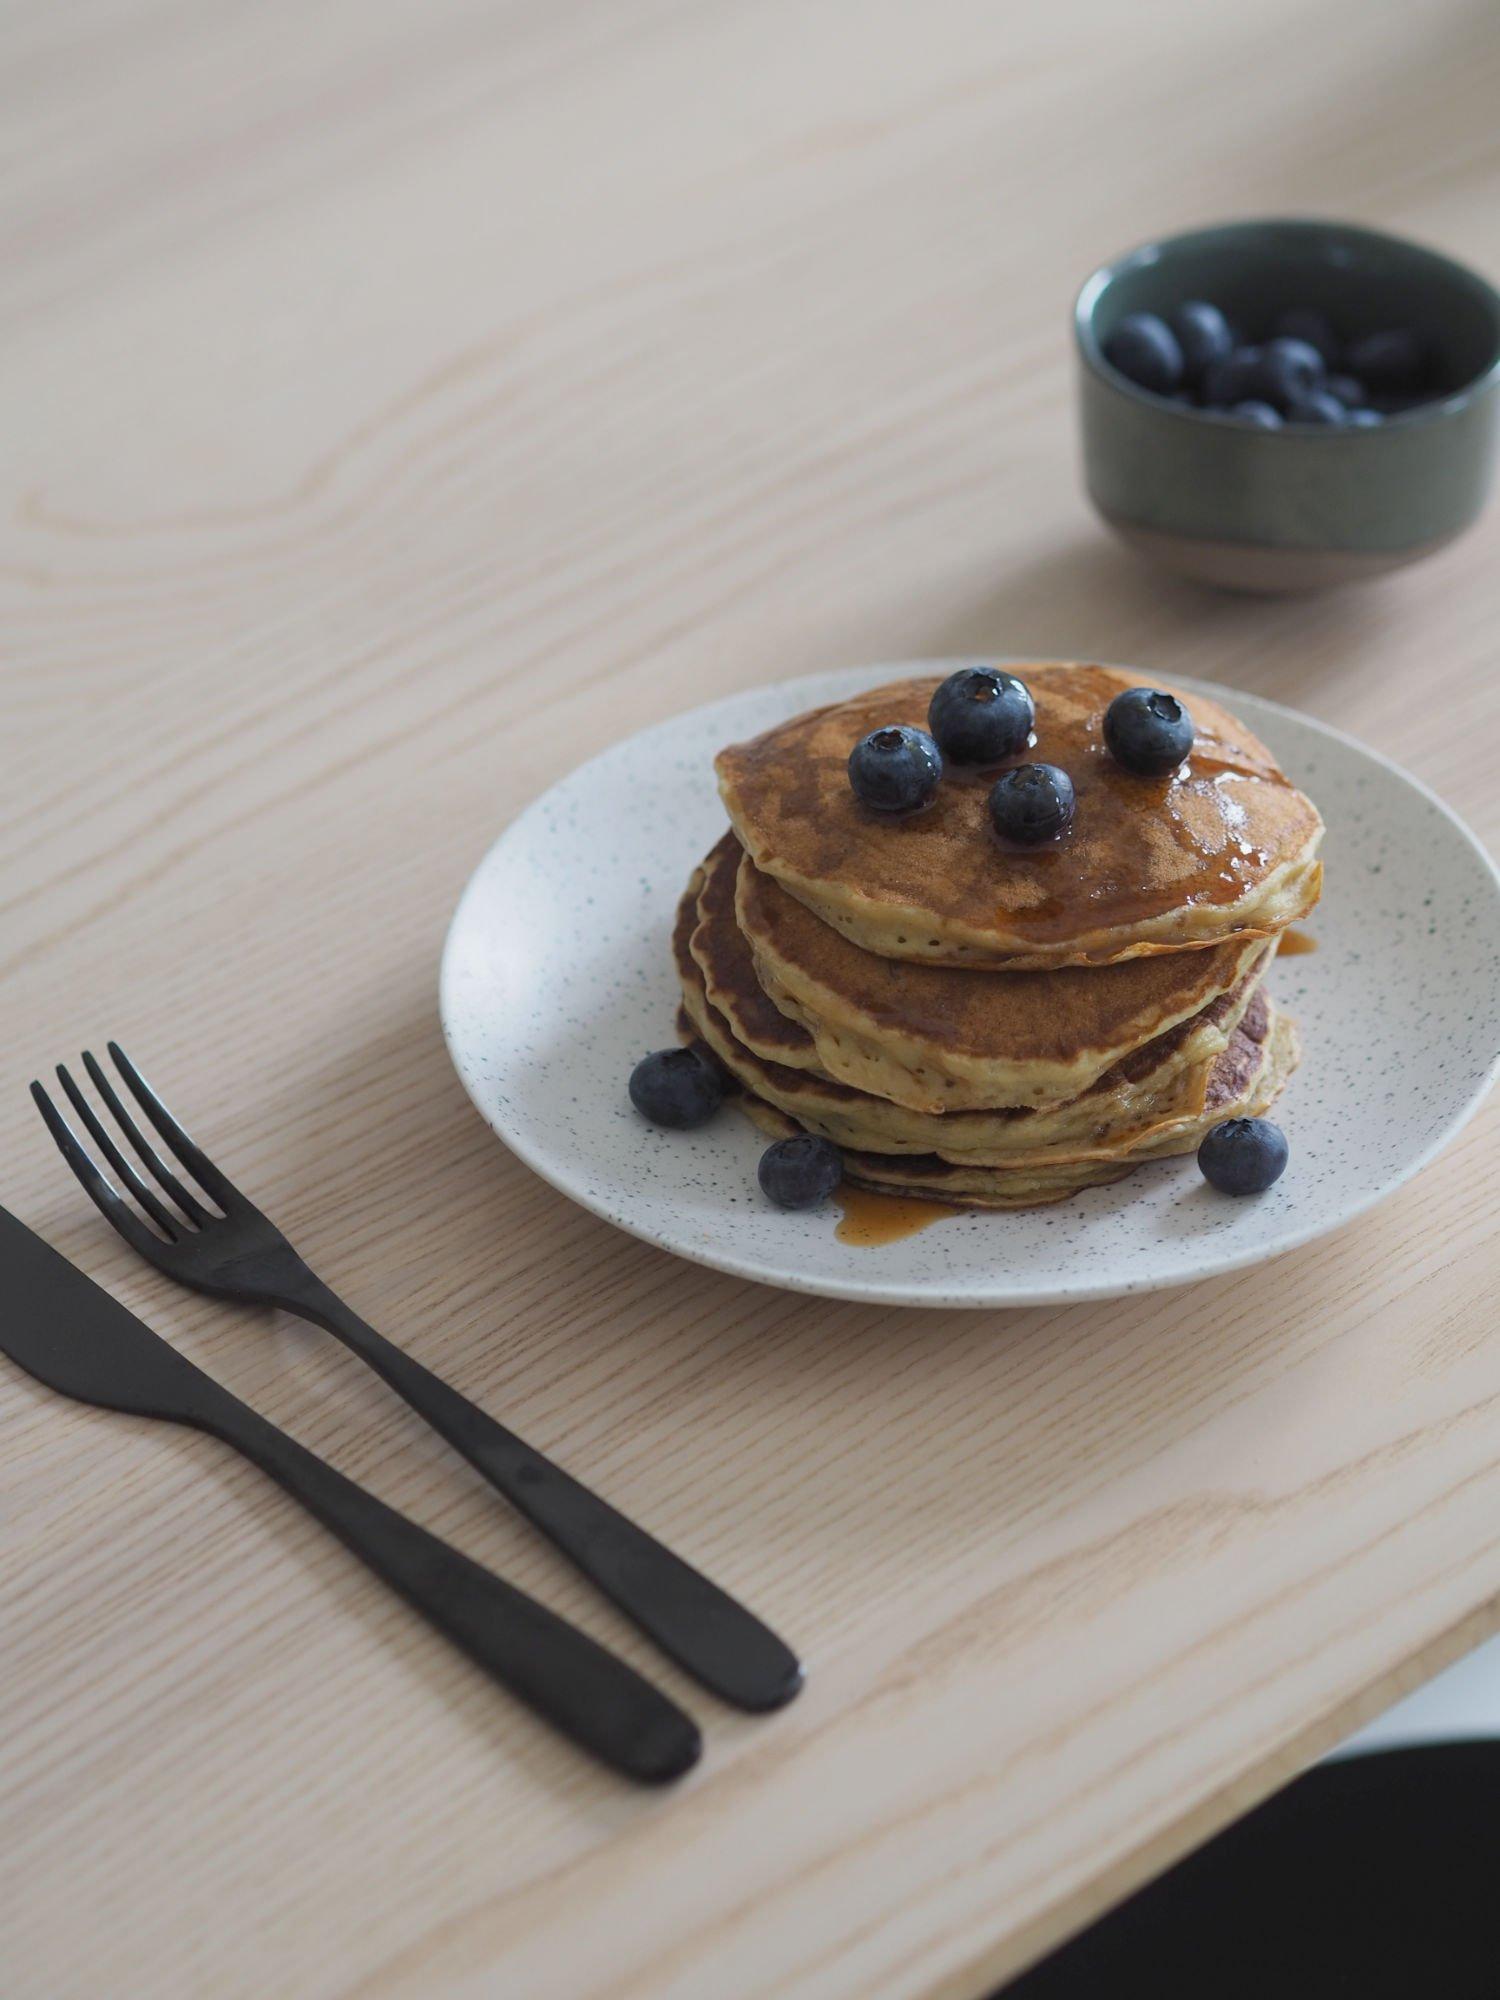 thatscandinavianfeeling breakfast hygge home pancakes